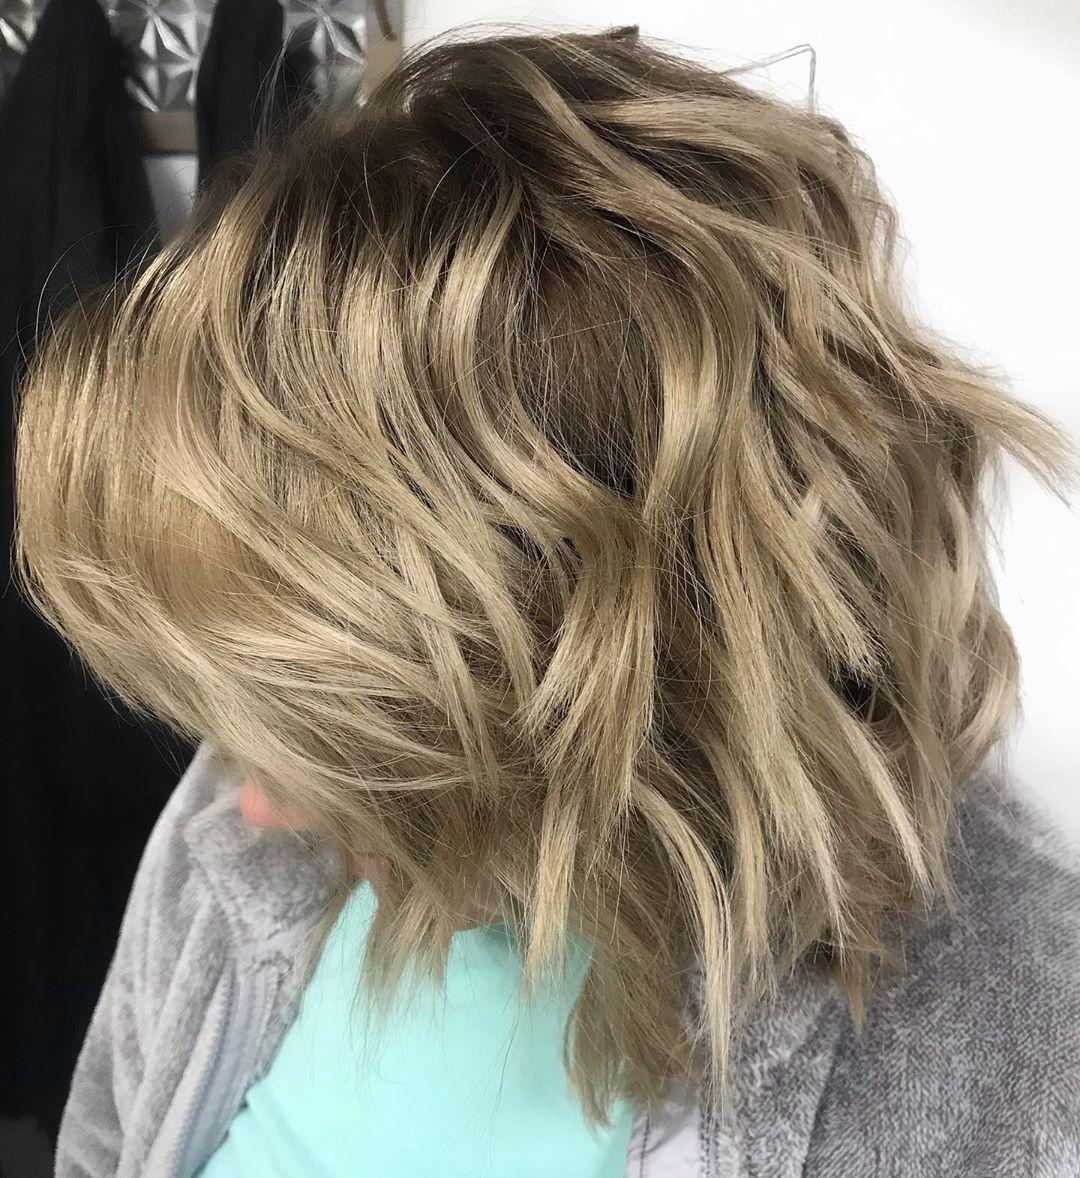 18 Instagram Worthy Short Hairstyles   Short hair pictures, Hair ...